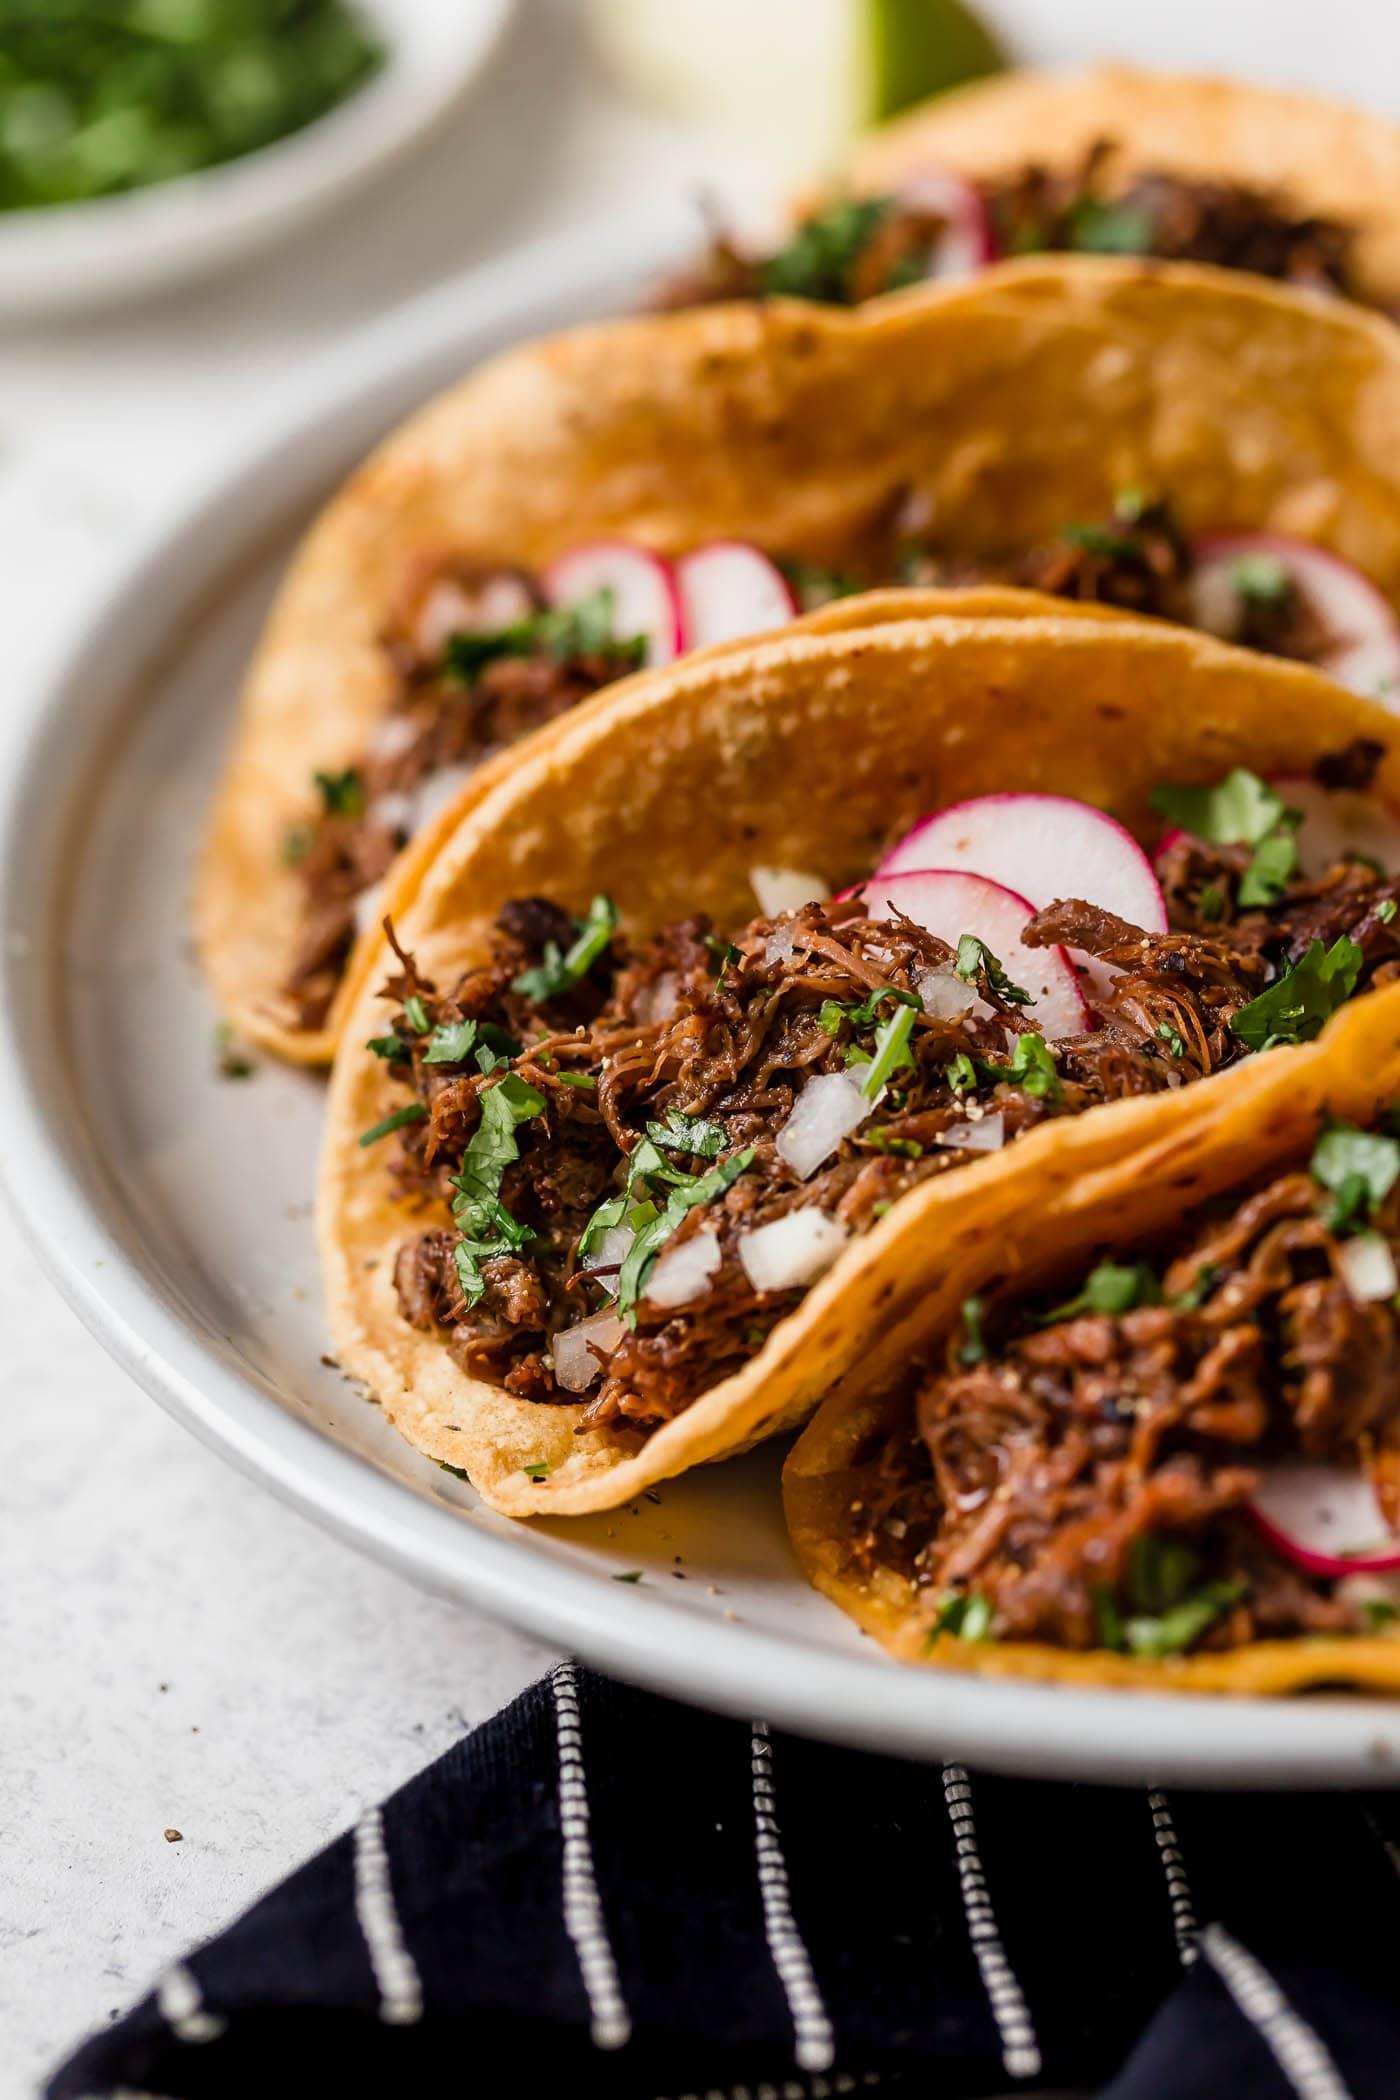 Barbacoa beef layered into tacos